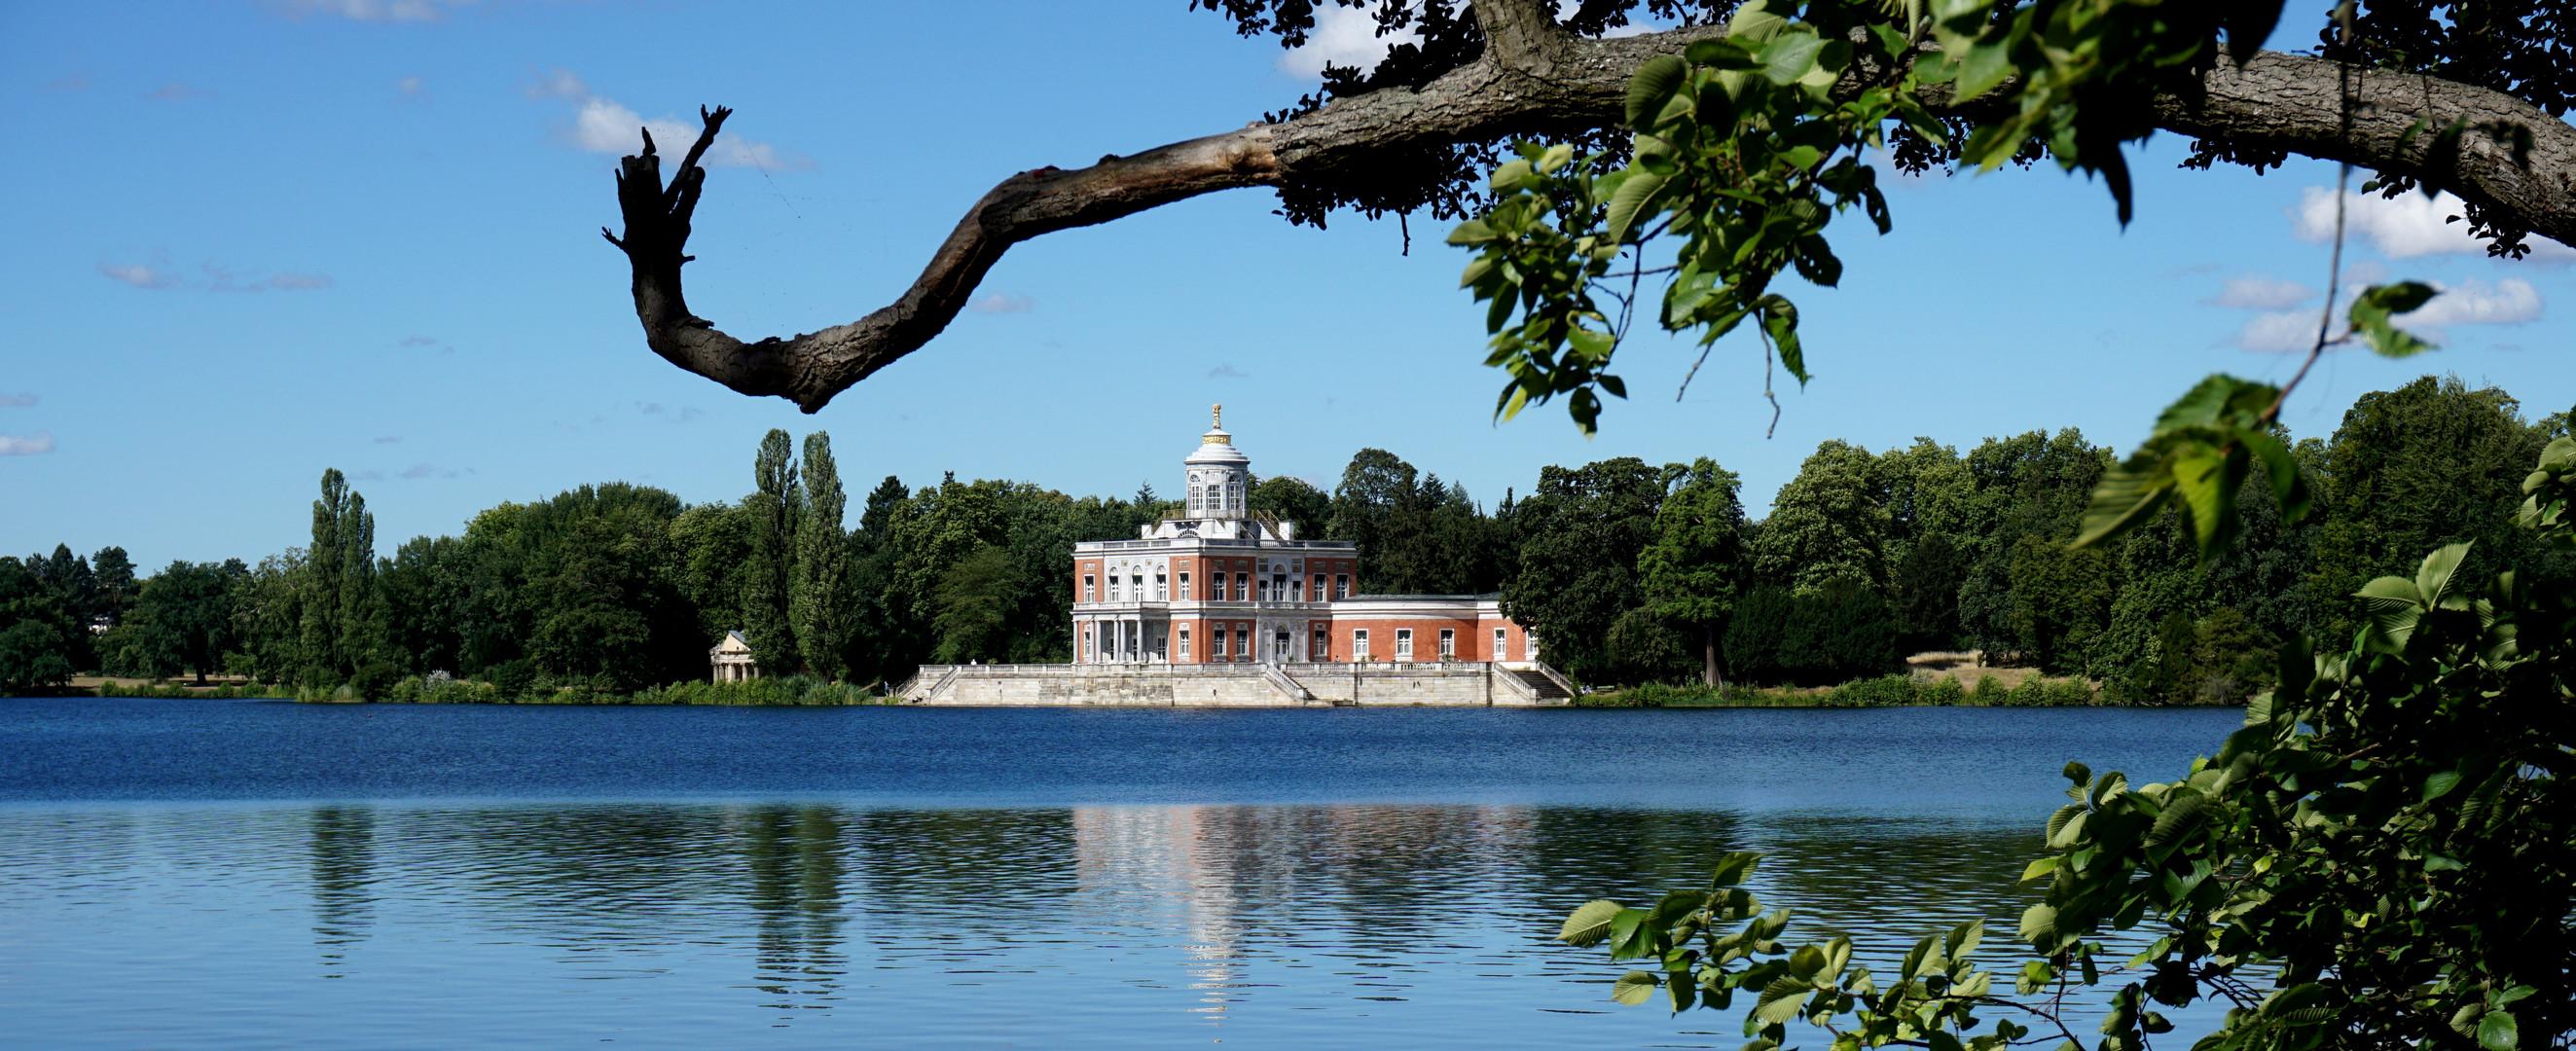 Marmorpalais Potsdam in Neuen Garten